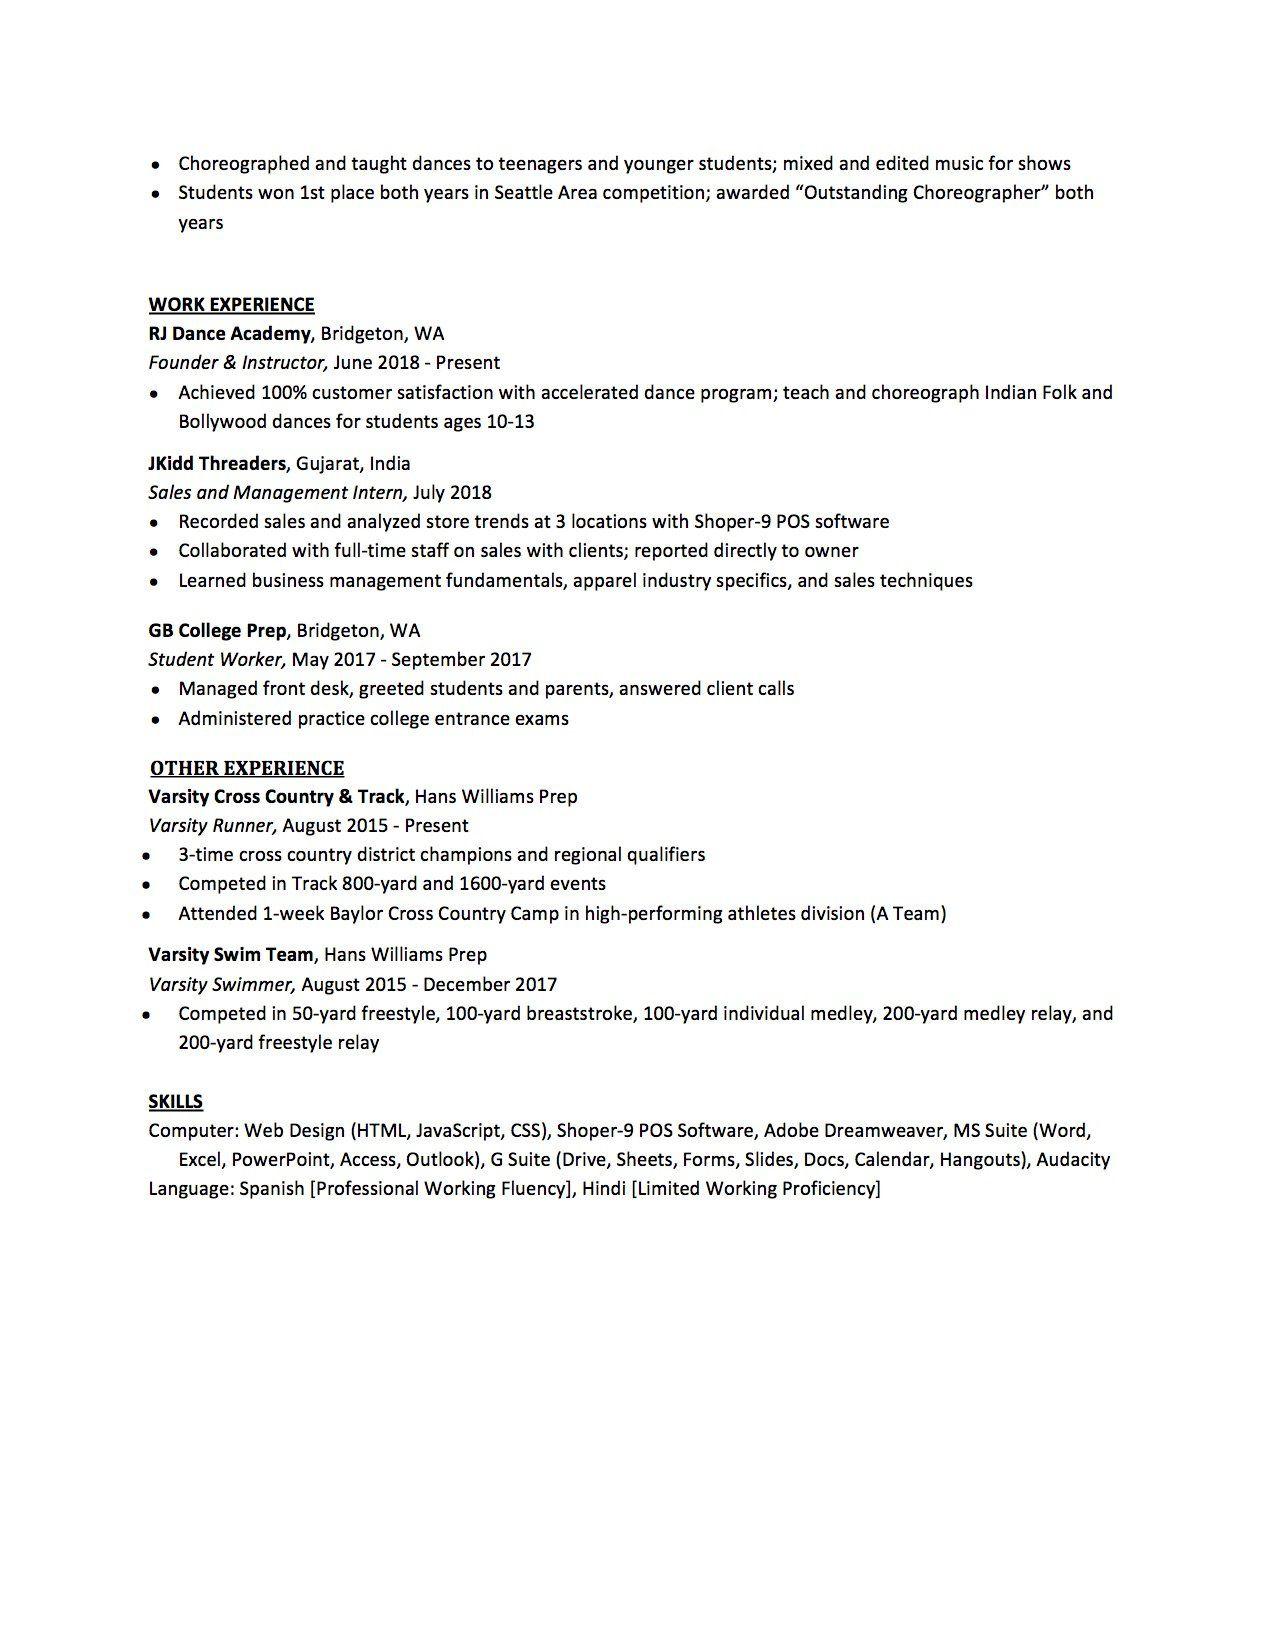 008 Simple Resume Template High School Photo  Student Australia For Google Doc Graduate Microsoft WordFull